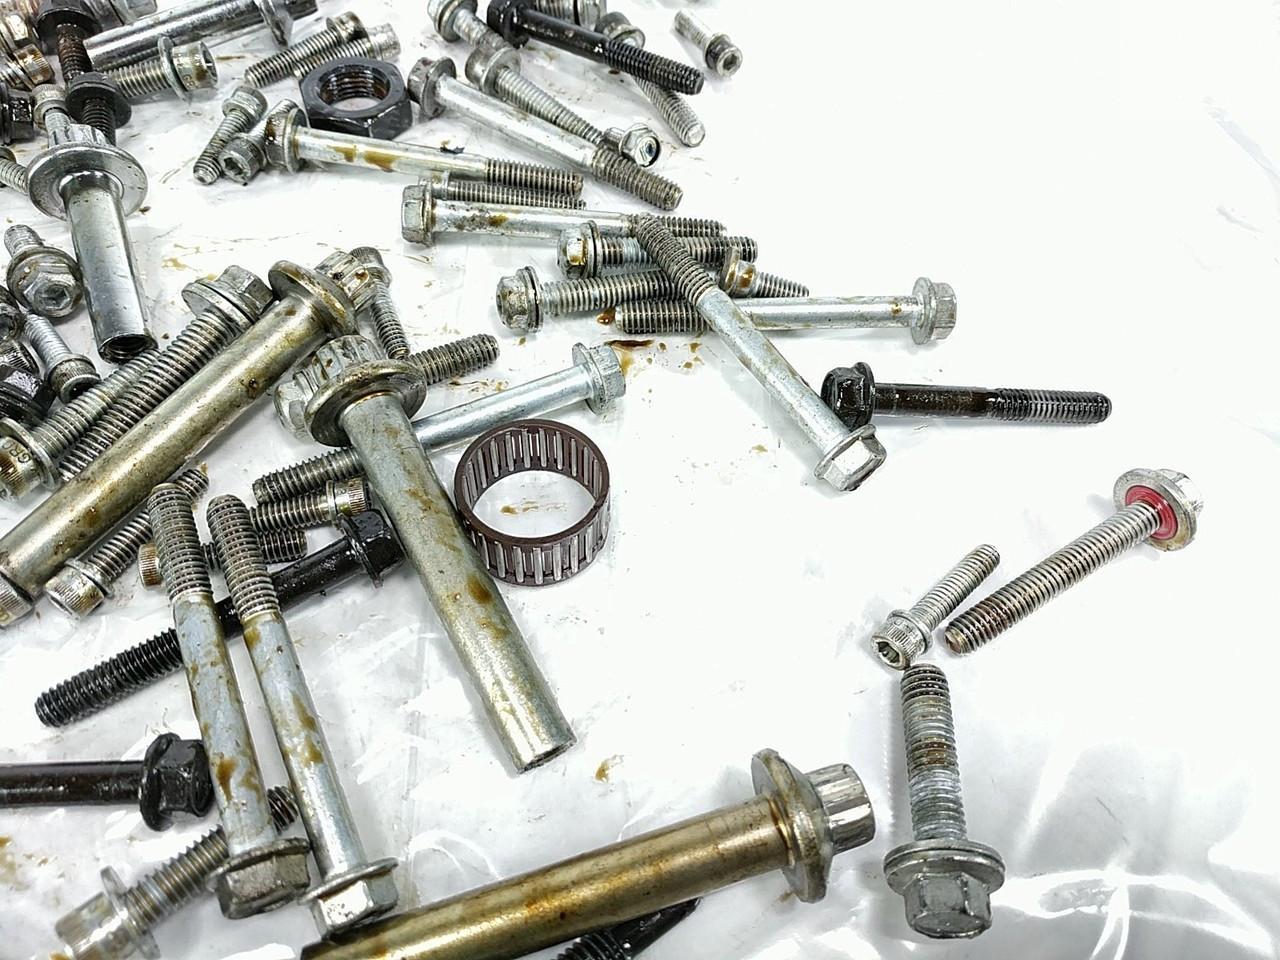 16 Harley Davidson FLHX Street Glide Miscellaneous Engine Motor Hardware Kit